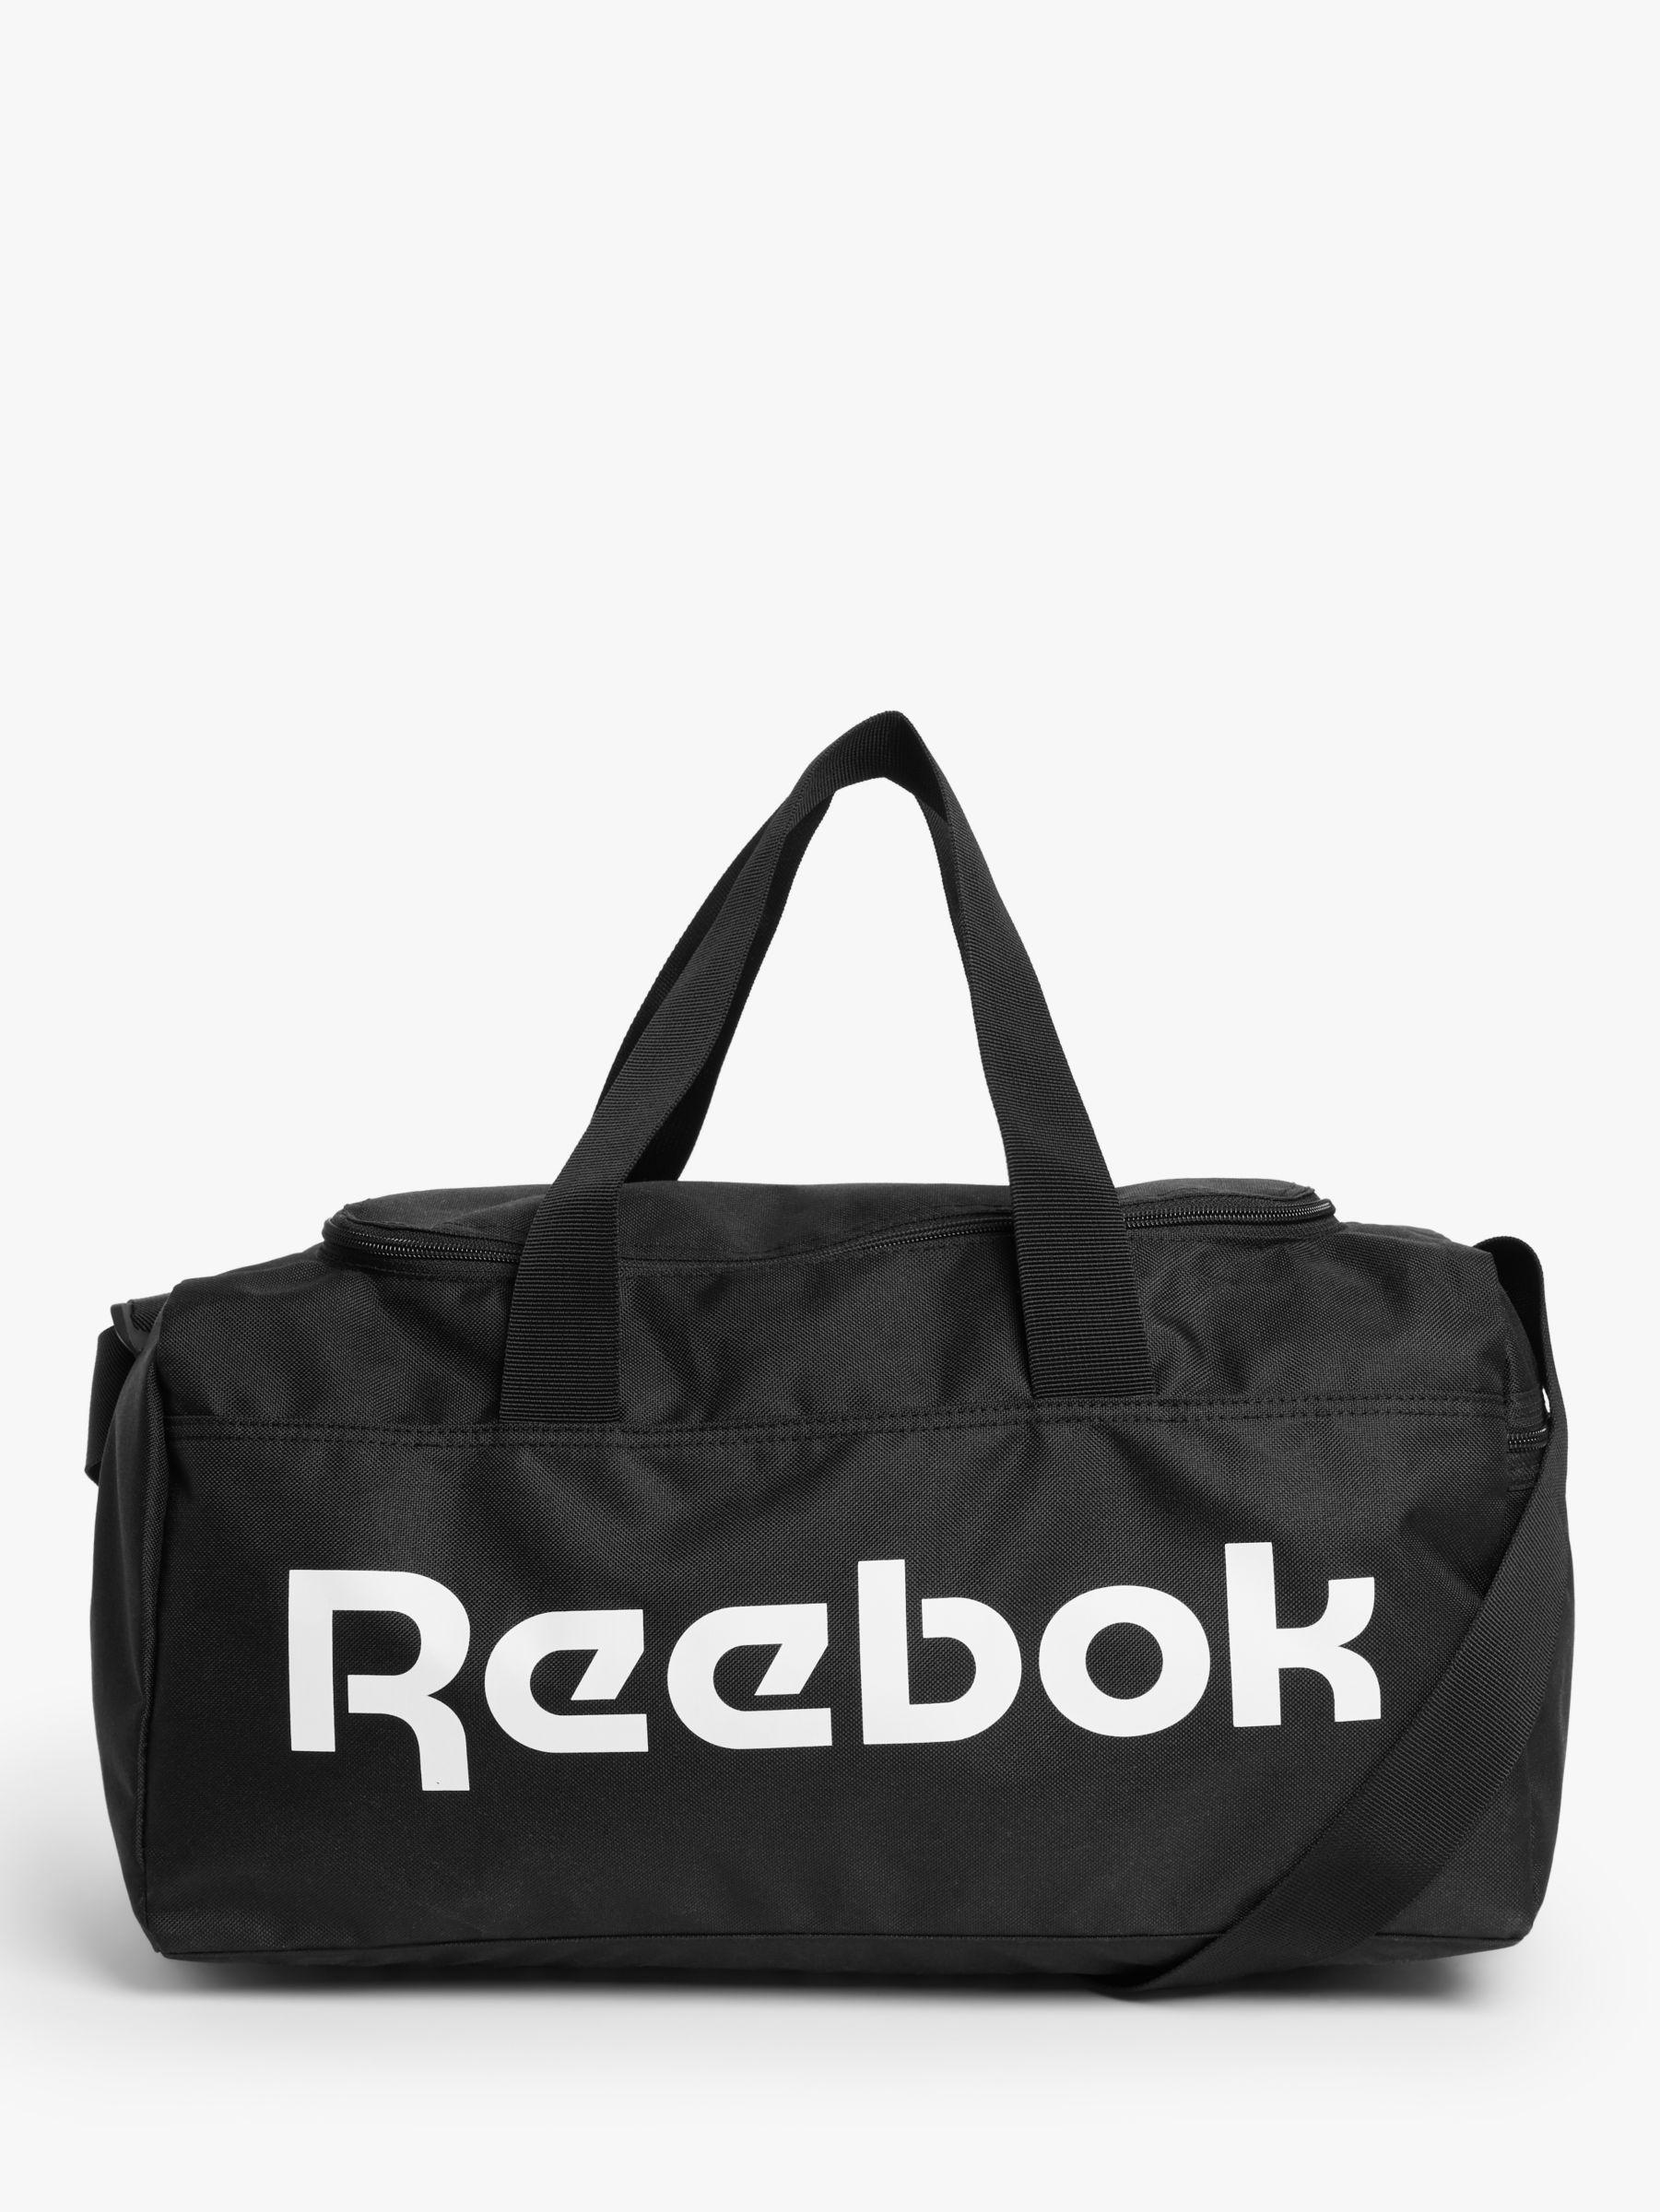 Reebok Reebok Active Core Small Grip Duffle Bag, Black